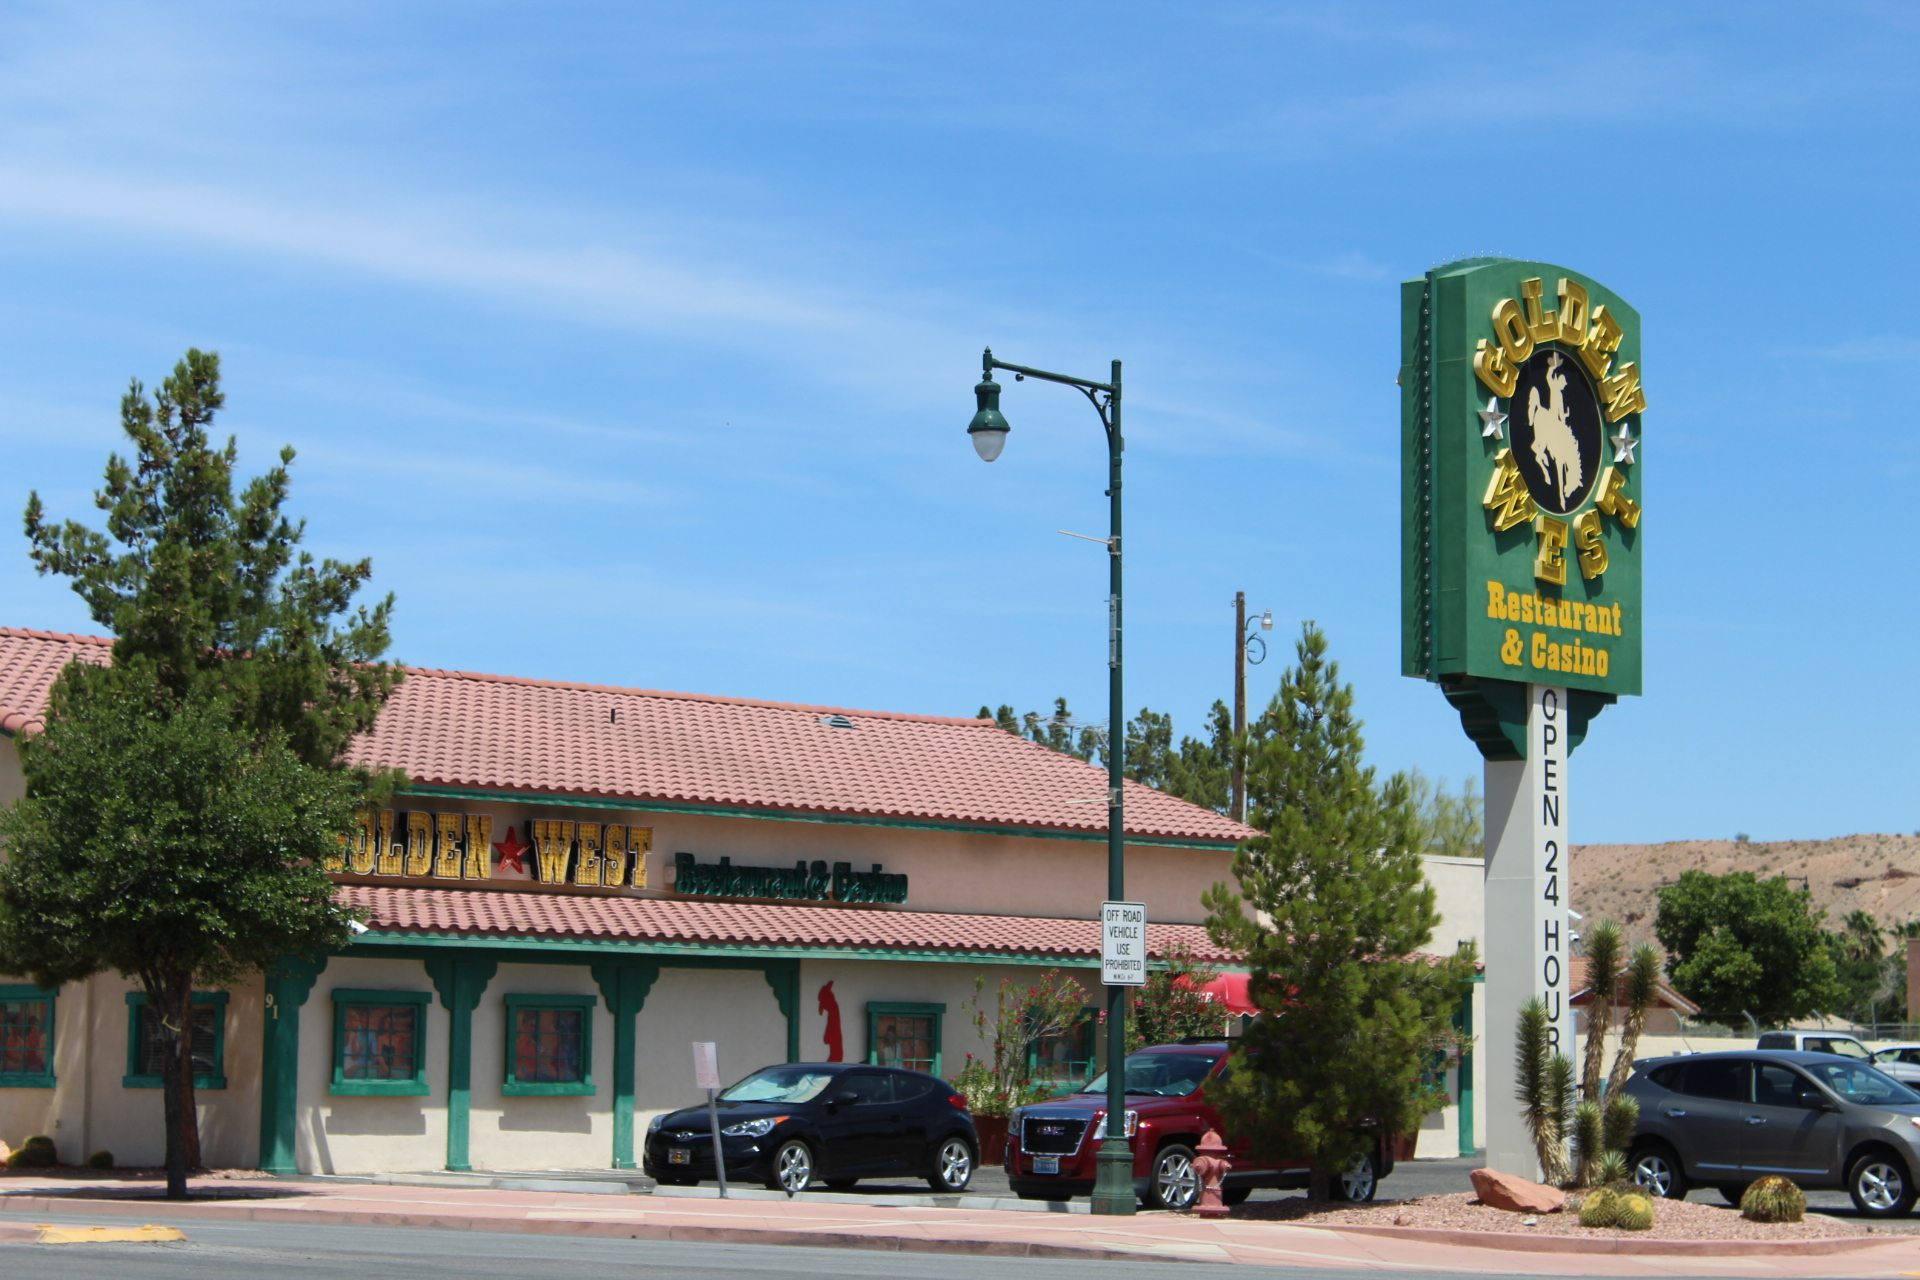 Golden West Restaurant